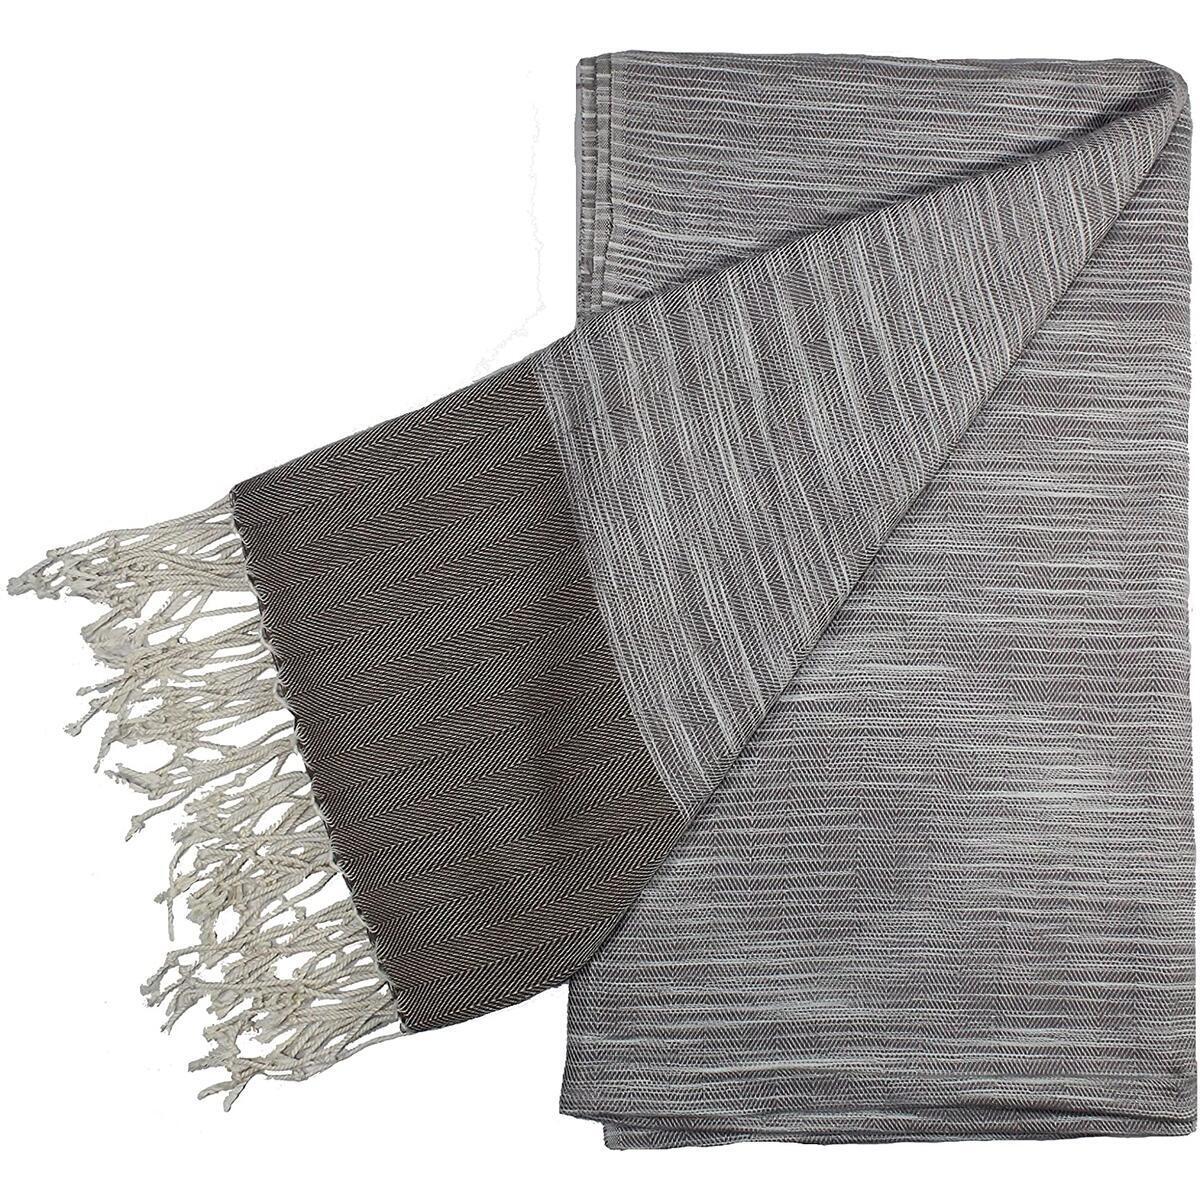 Premium Turkish Cotton Peshtemal Towel Handloom, Beach Towel, Bath Towel (Beige)